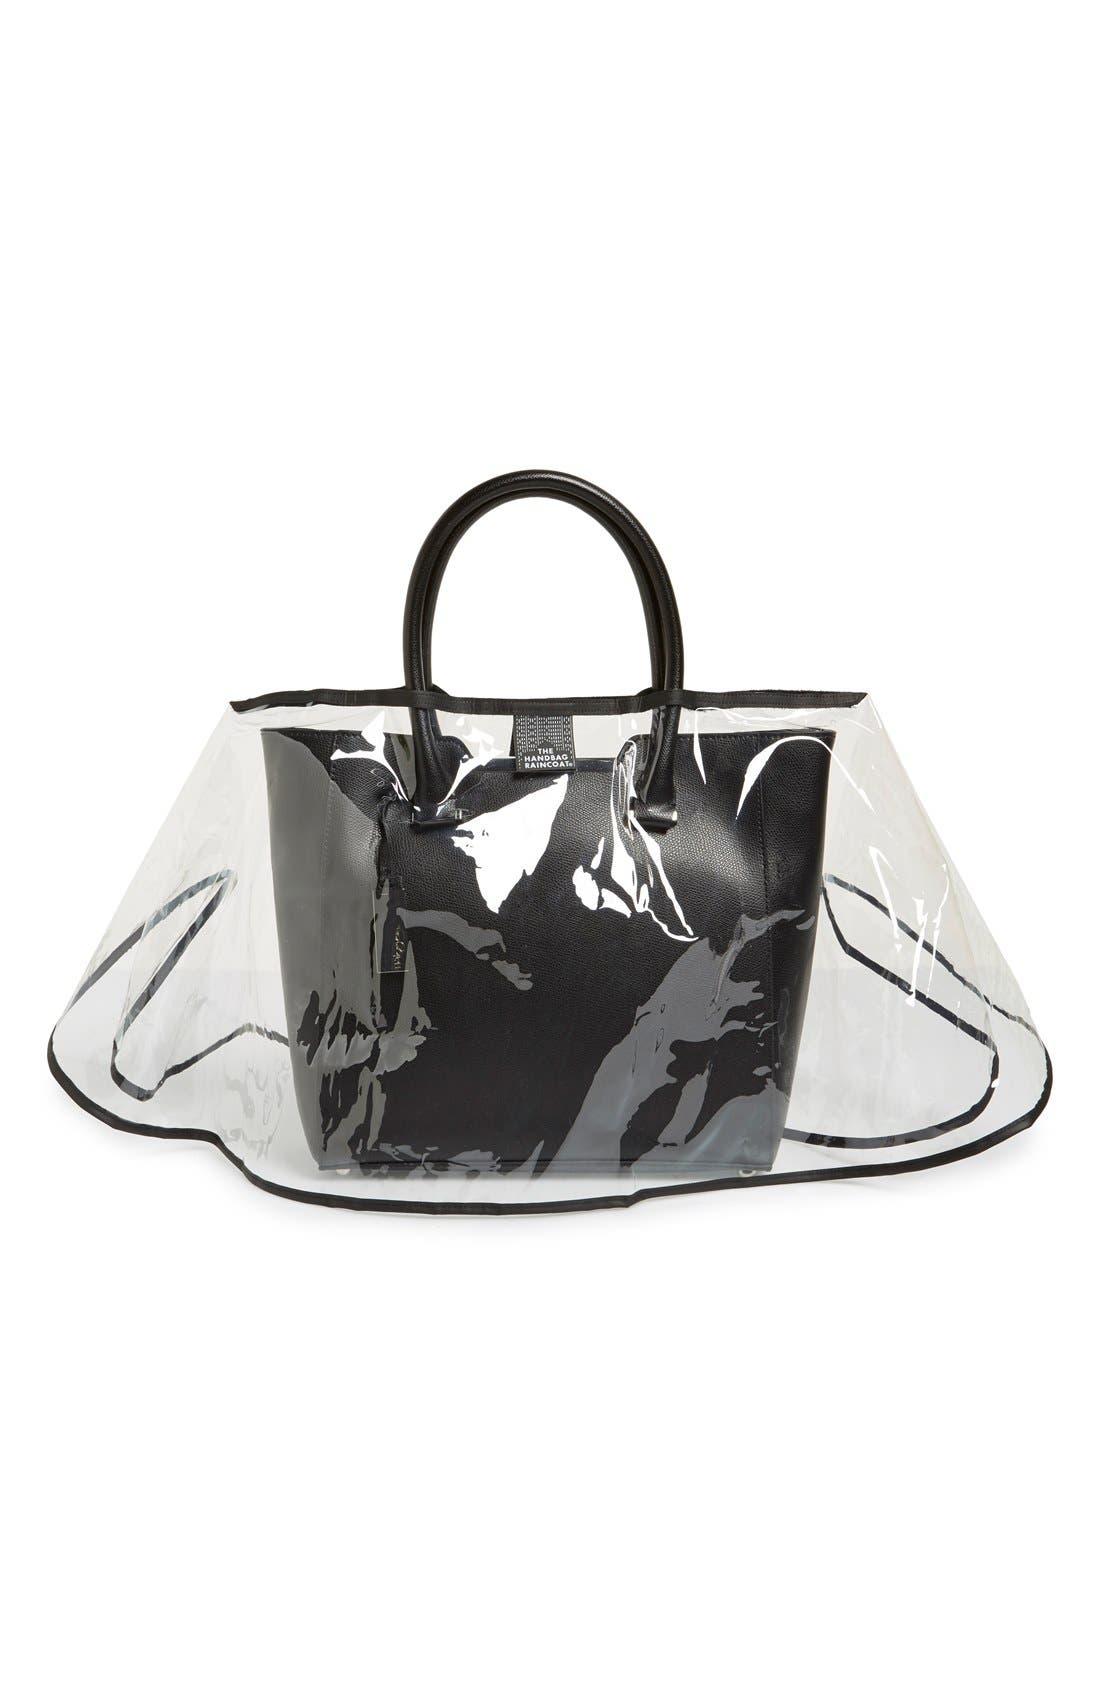 The Handbag Raincoat 'Midi - City Slicker' Handbag Protector